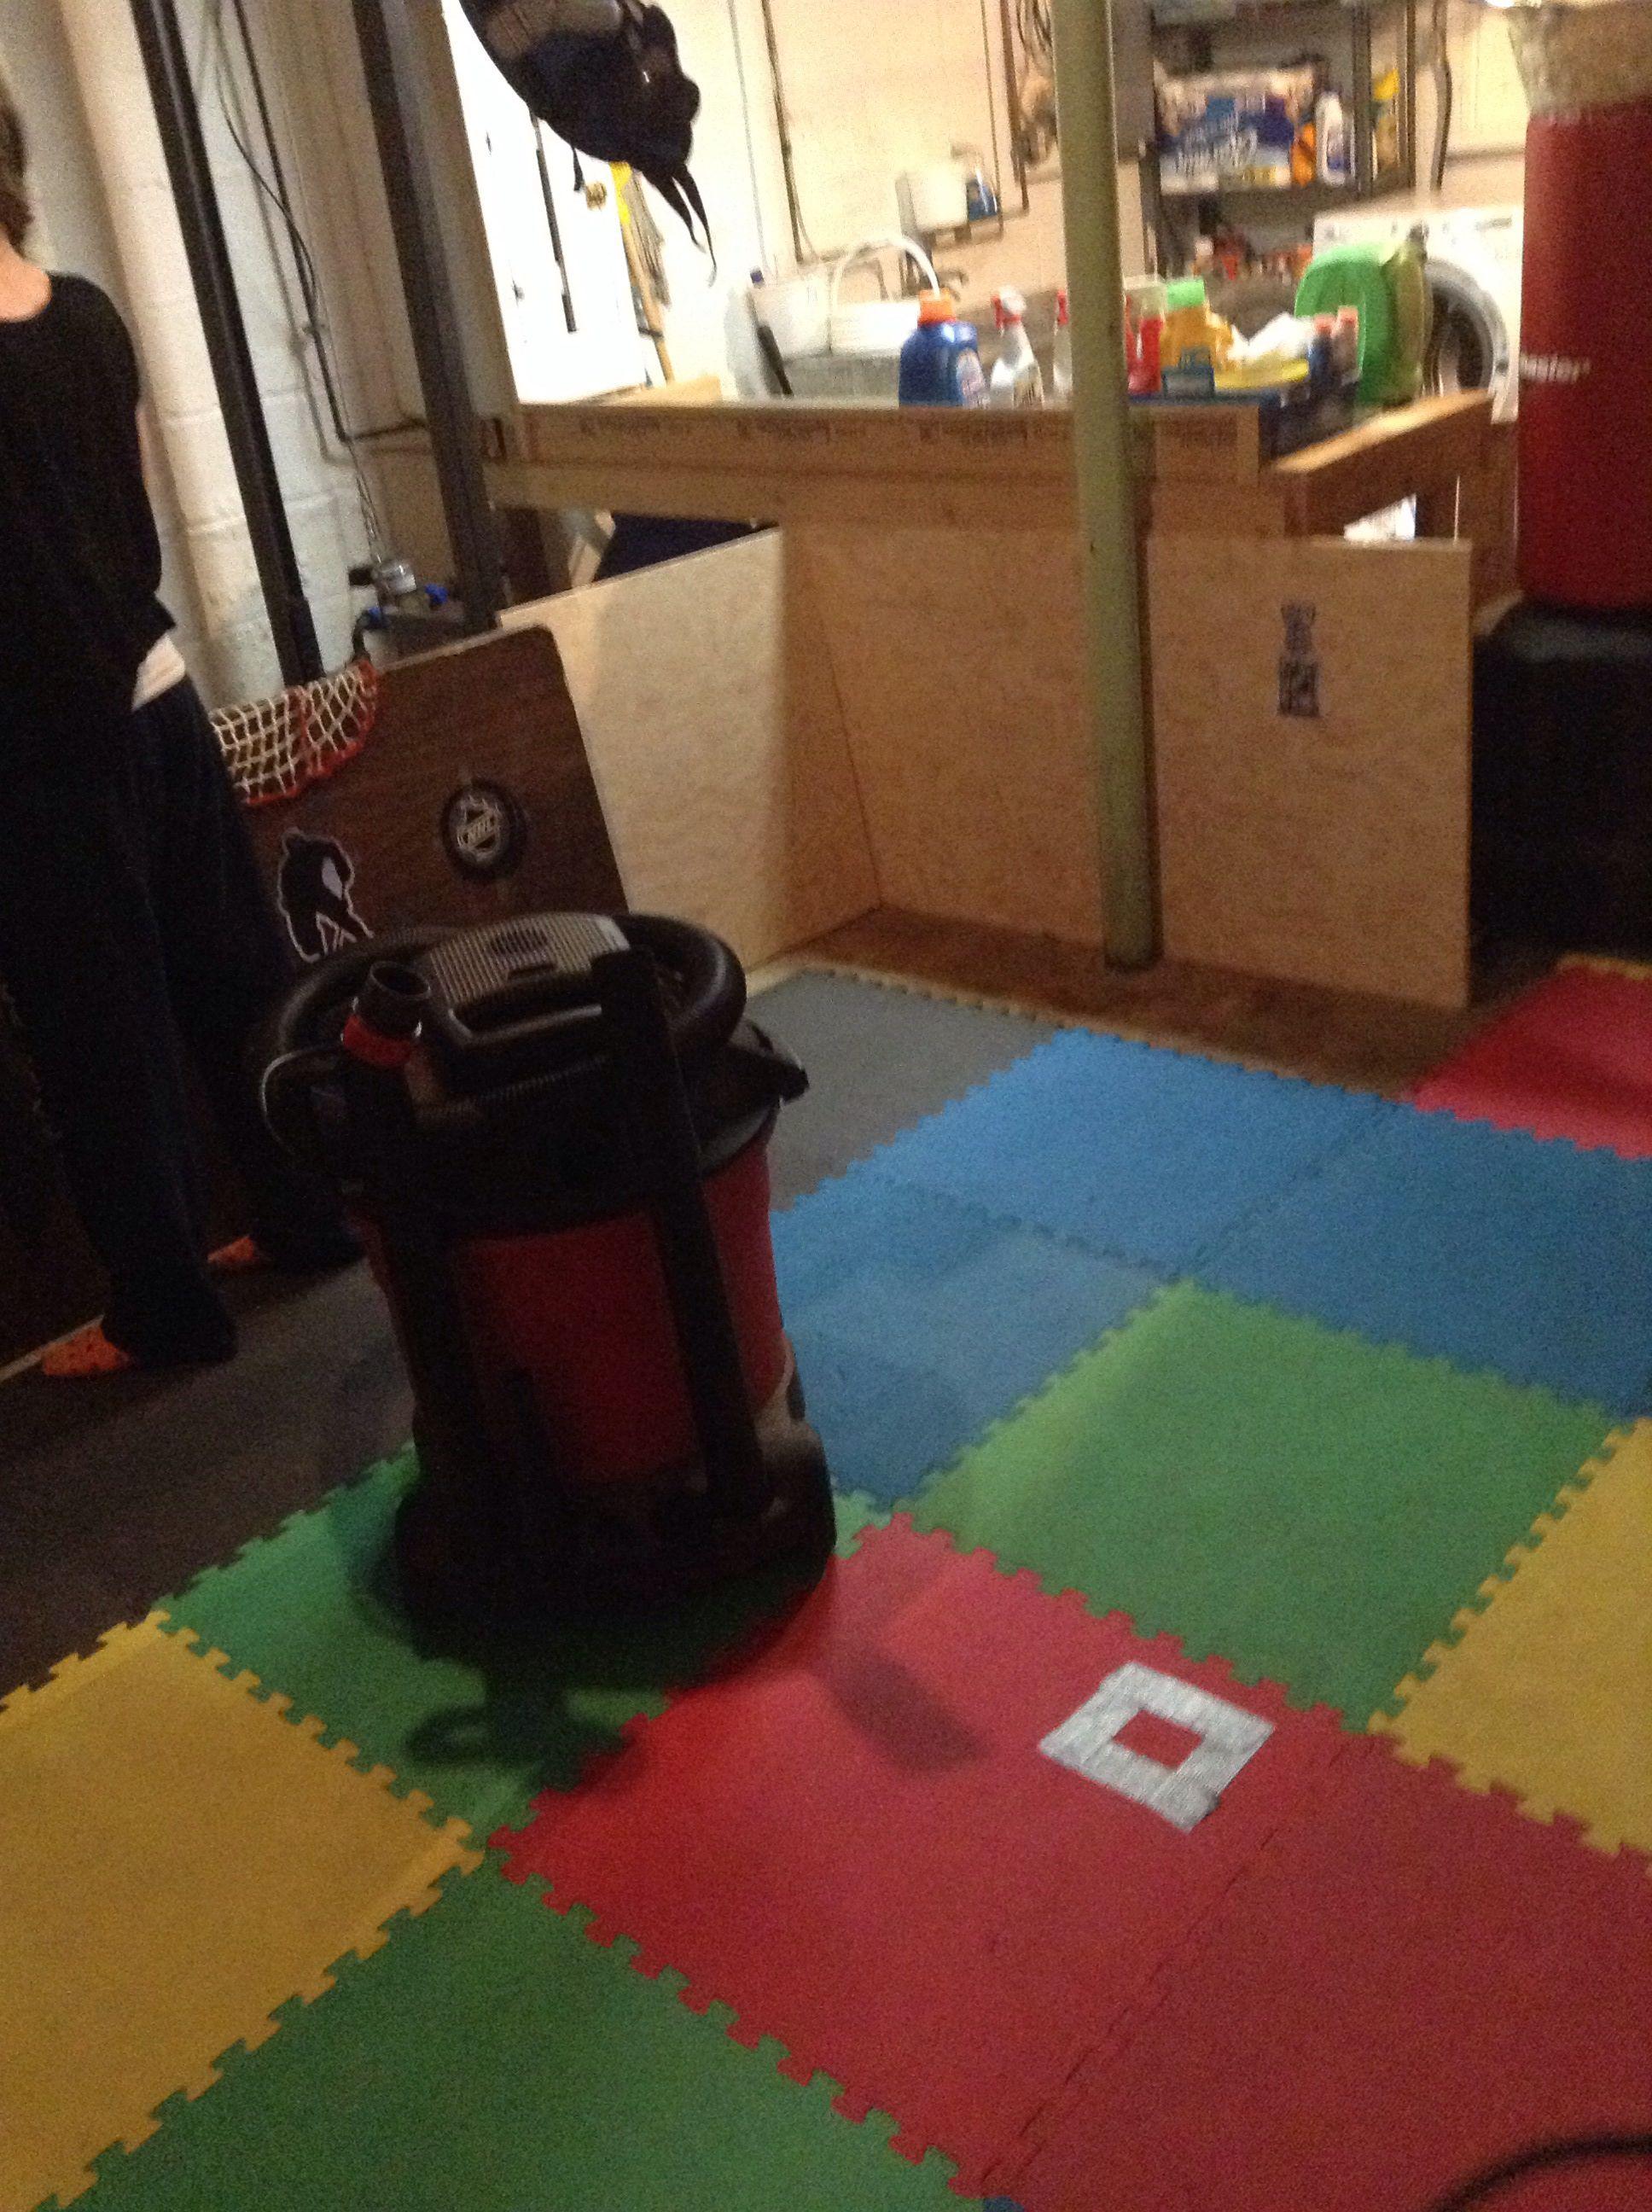 Basement Knee Hockey Rink In Progress Decor Home Decor Hockey